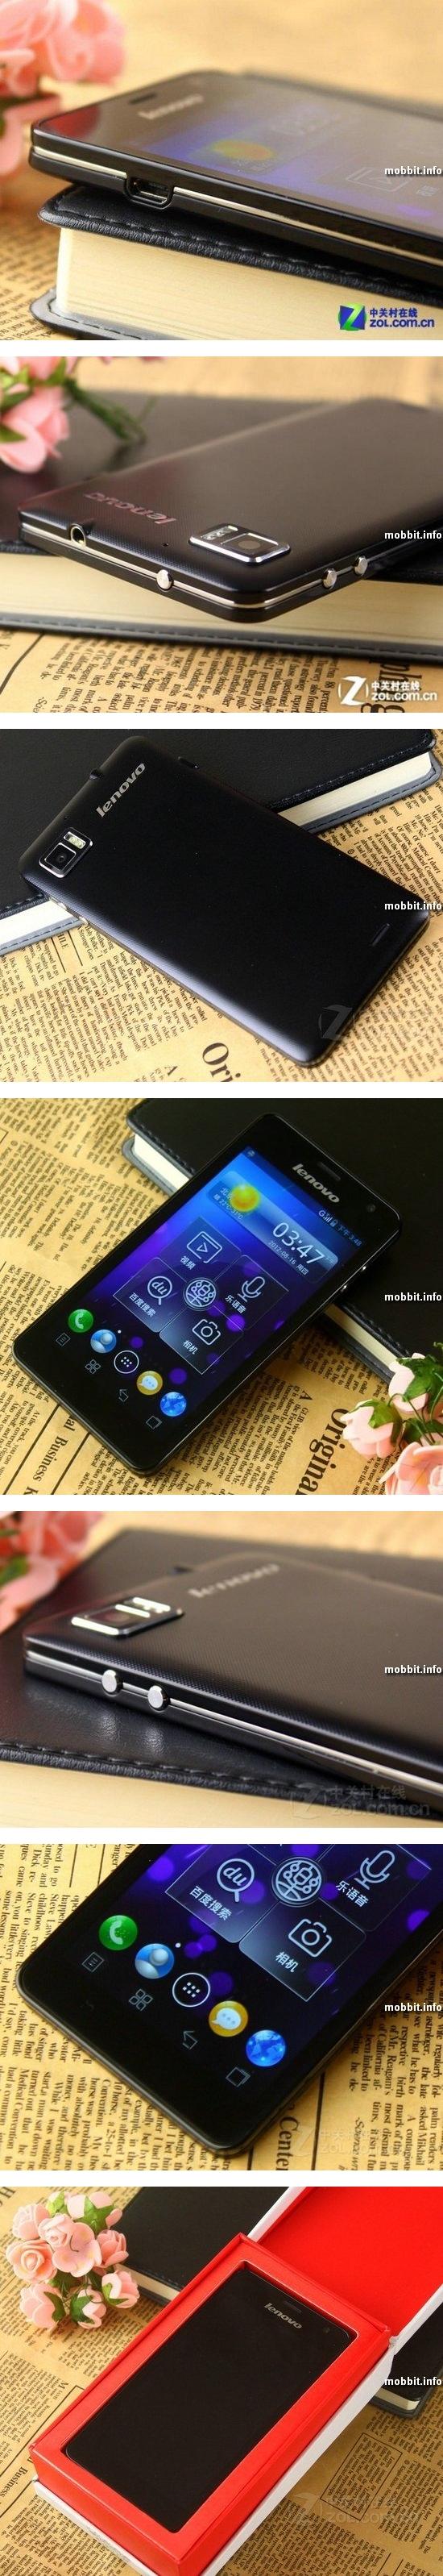 LePhone K860